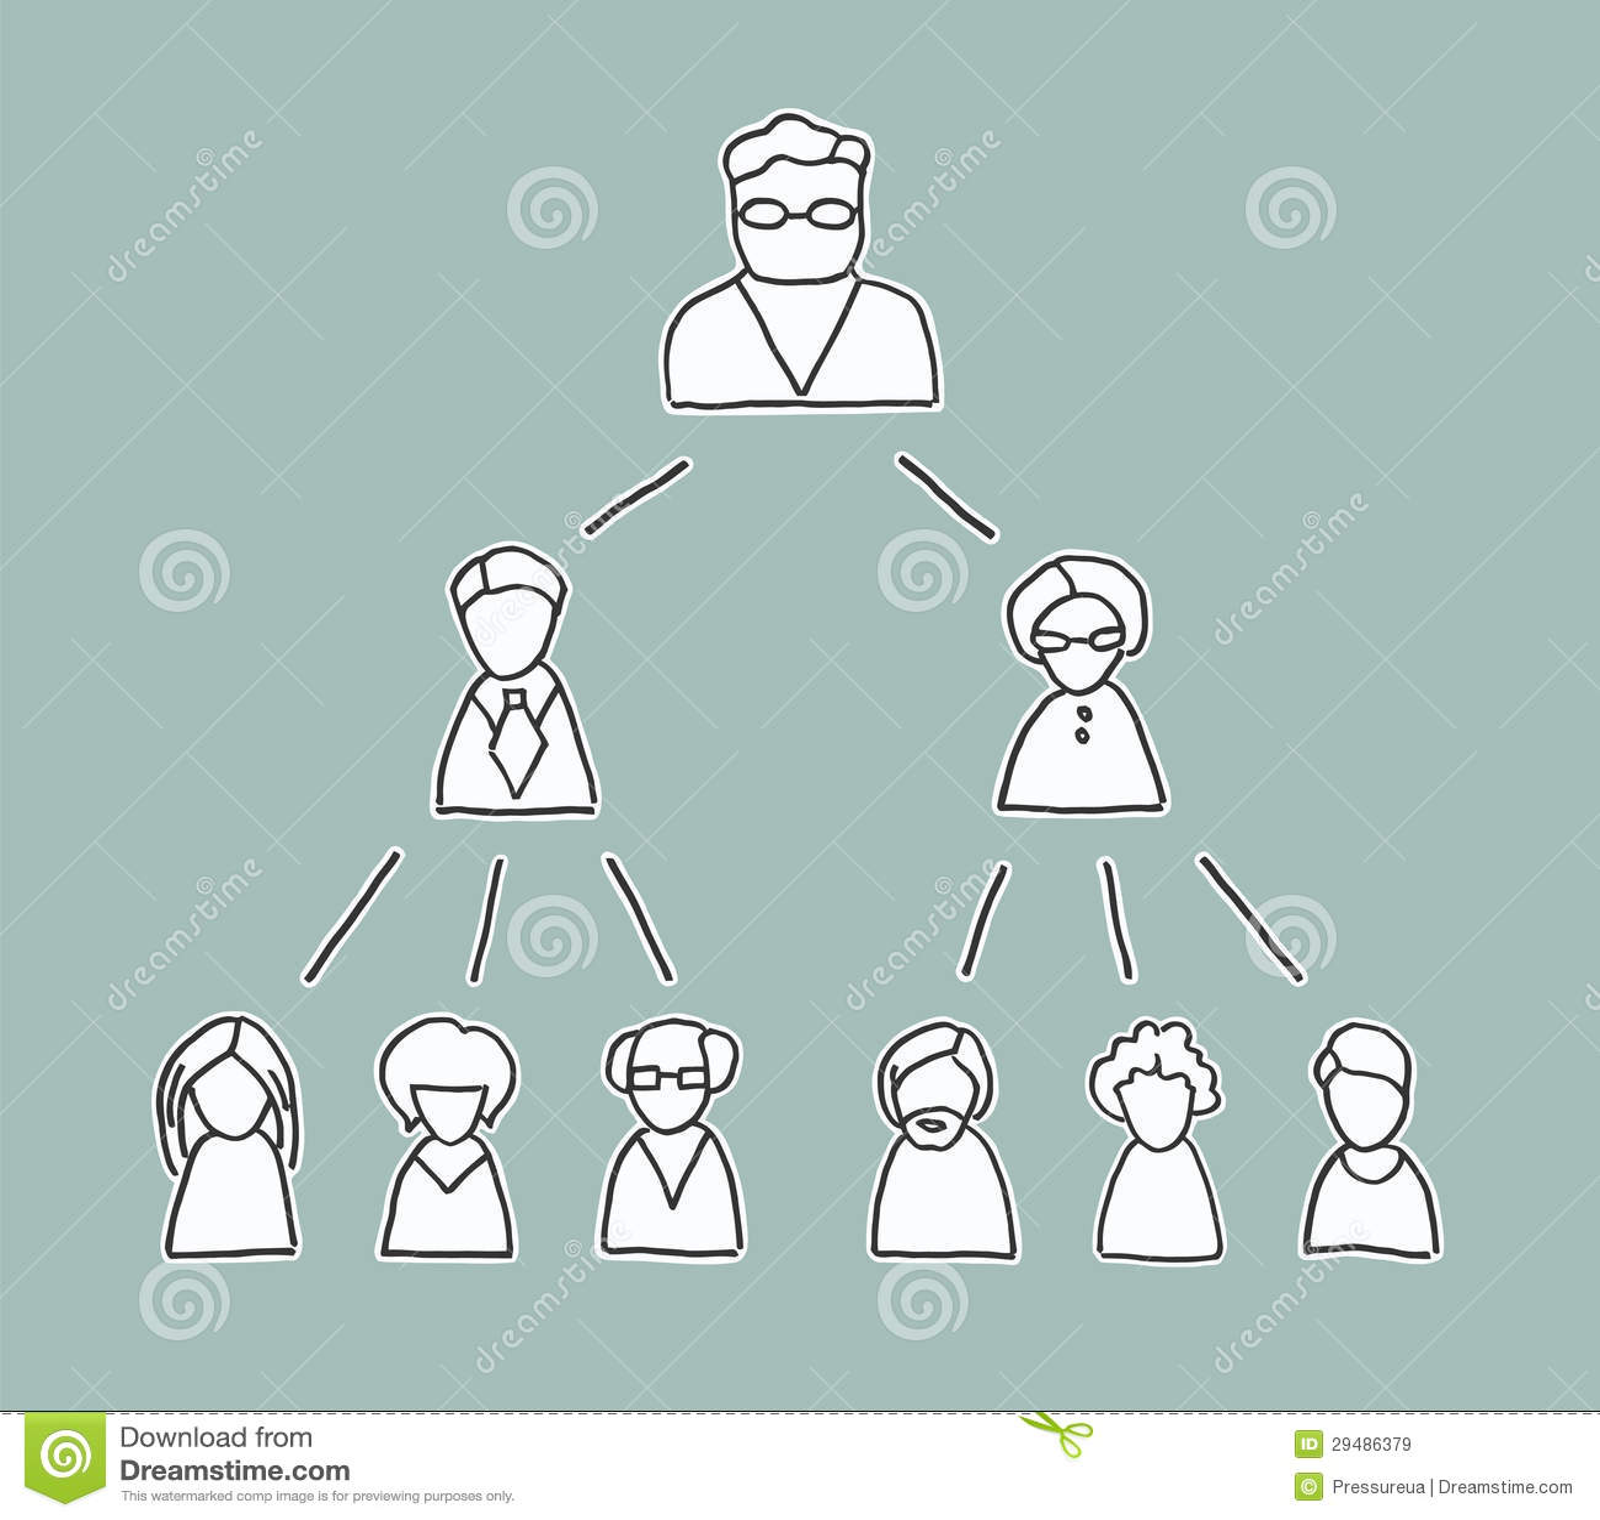 Management chart illustration